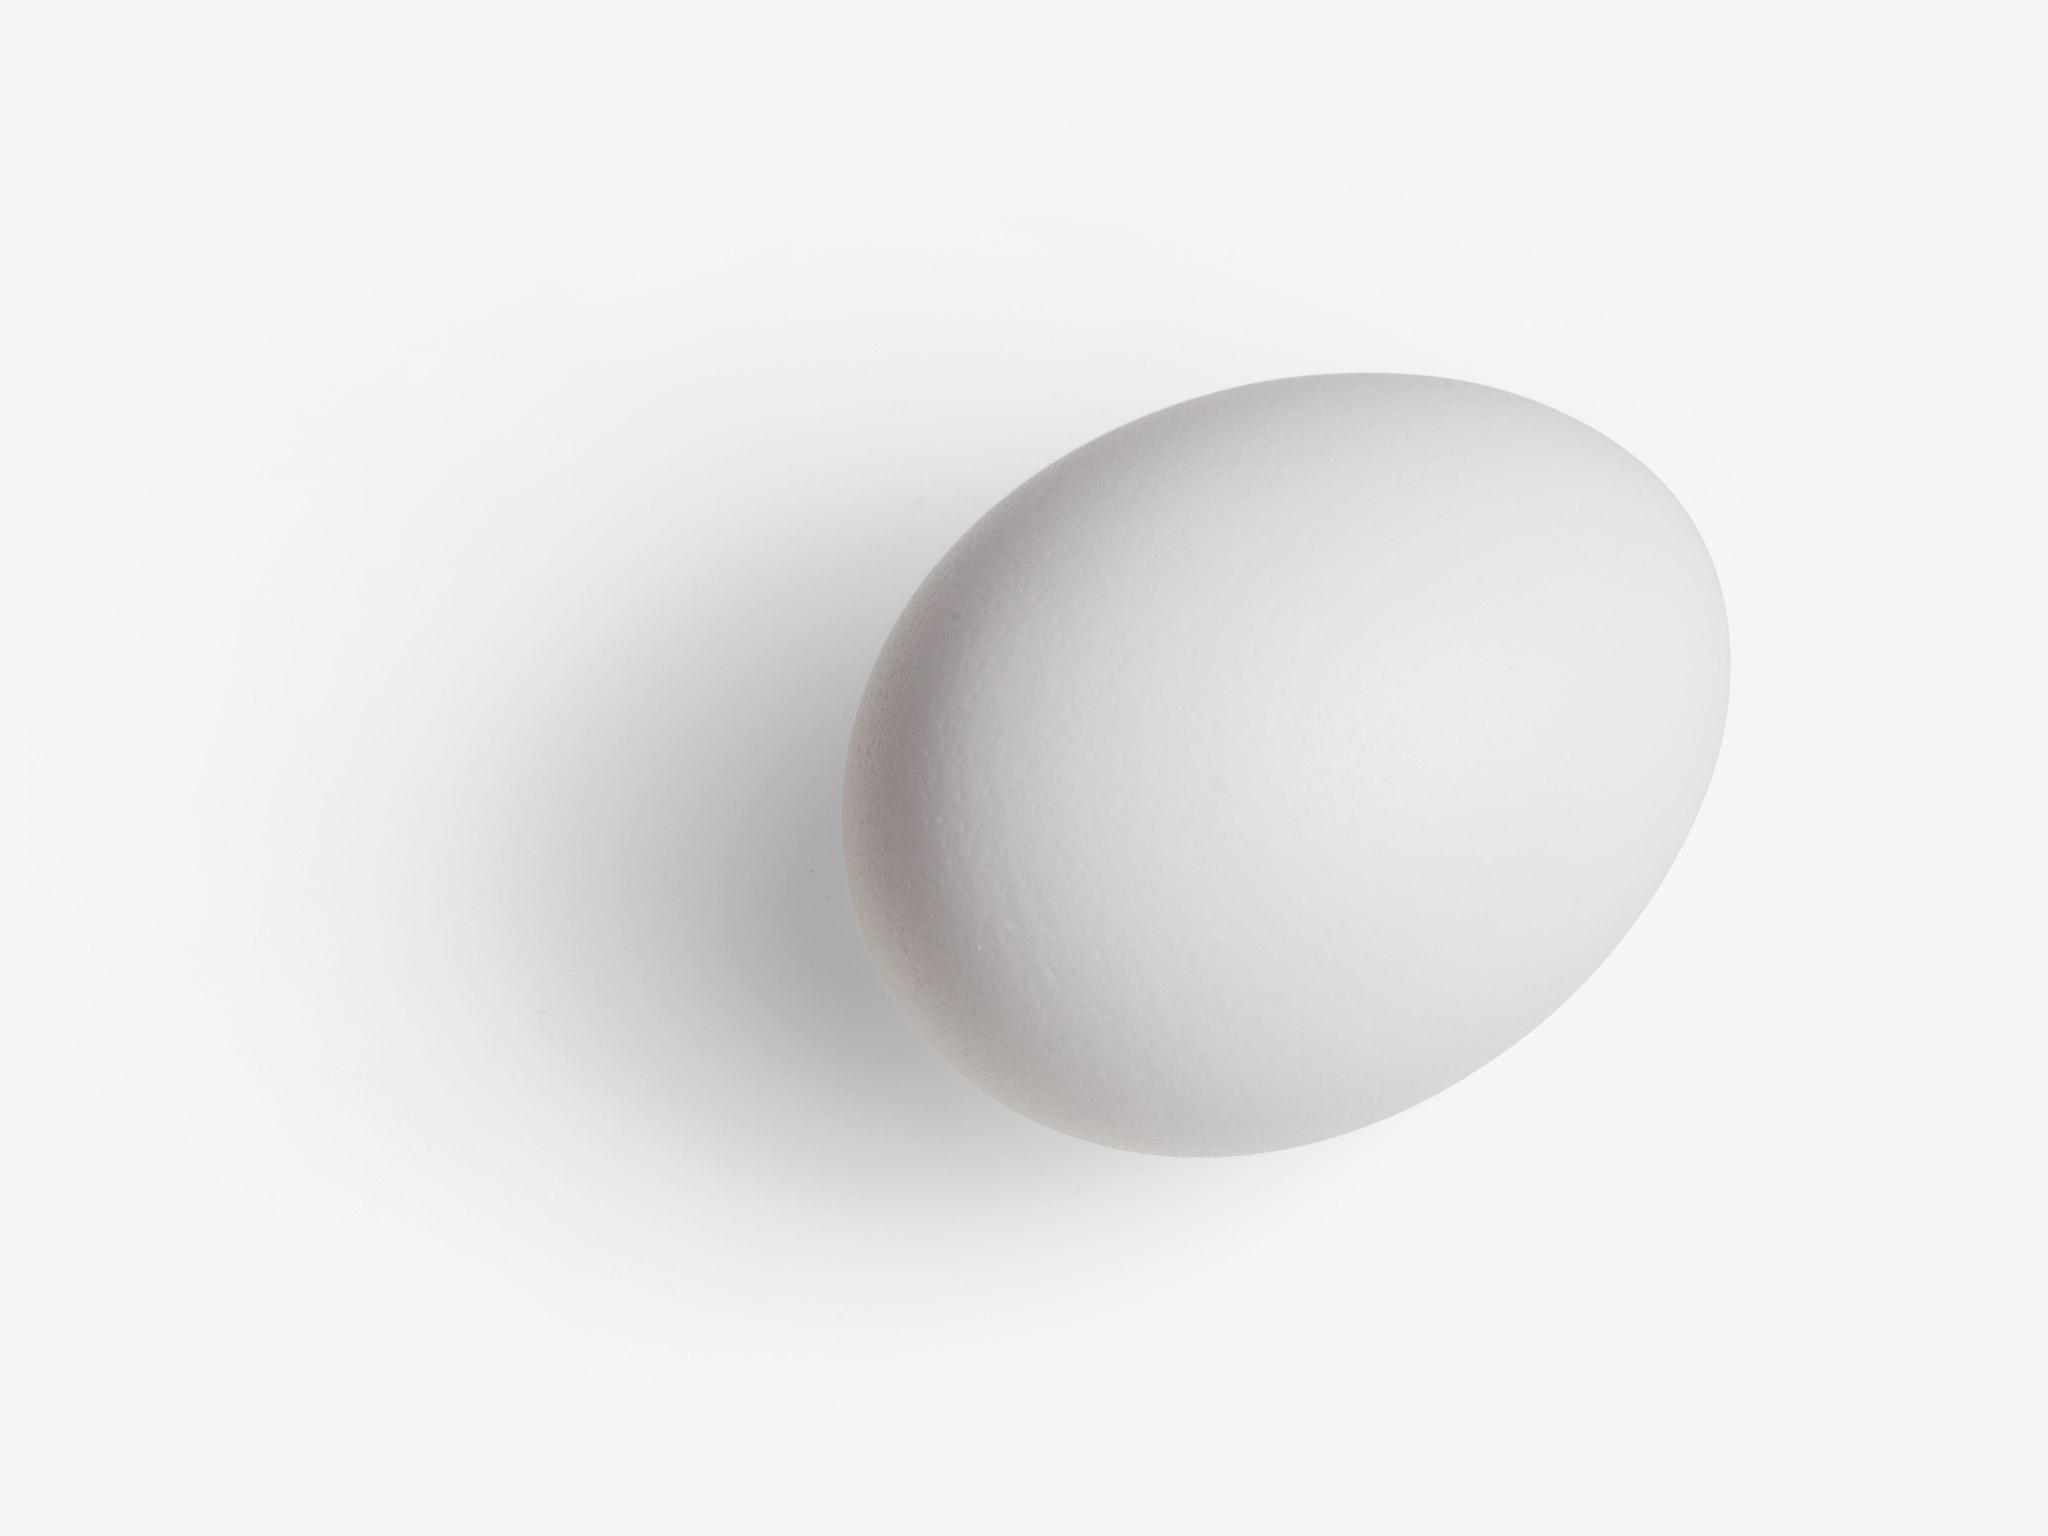 Egg image asset with transparent background